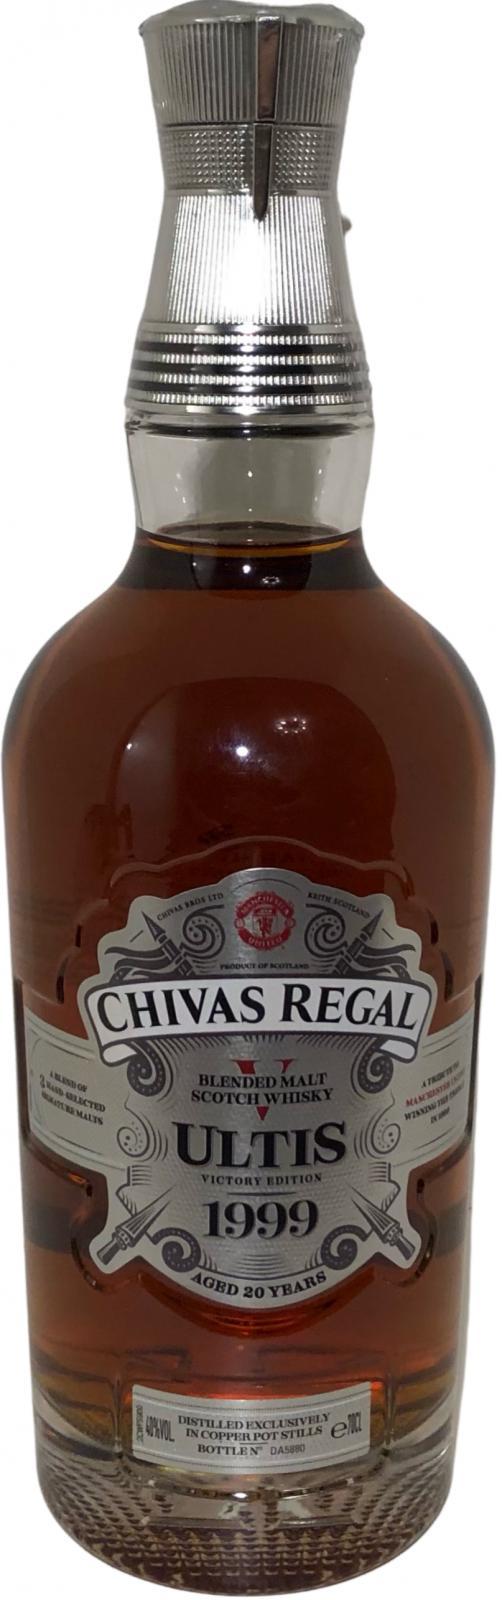 Chivas Regal Ultis 1999 Victory Edition